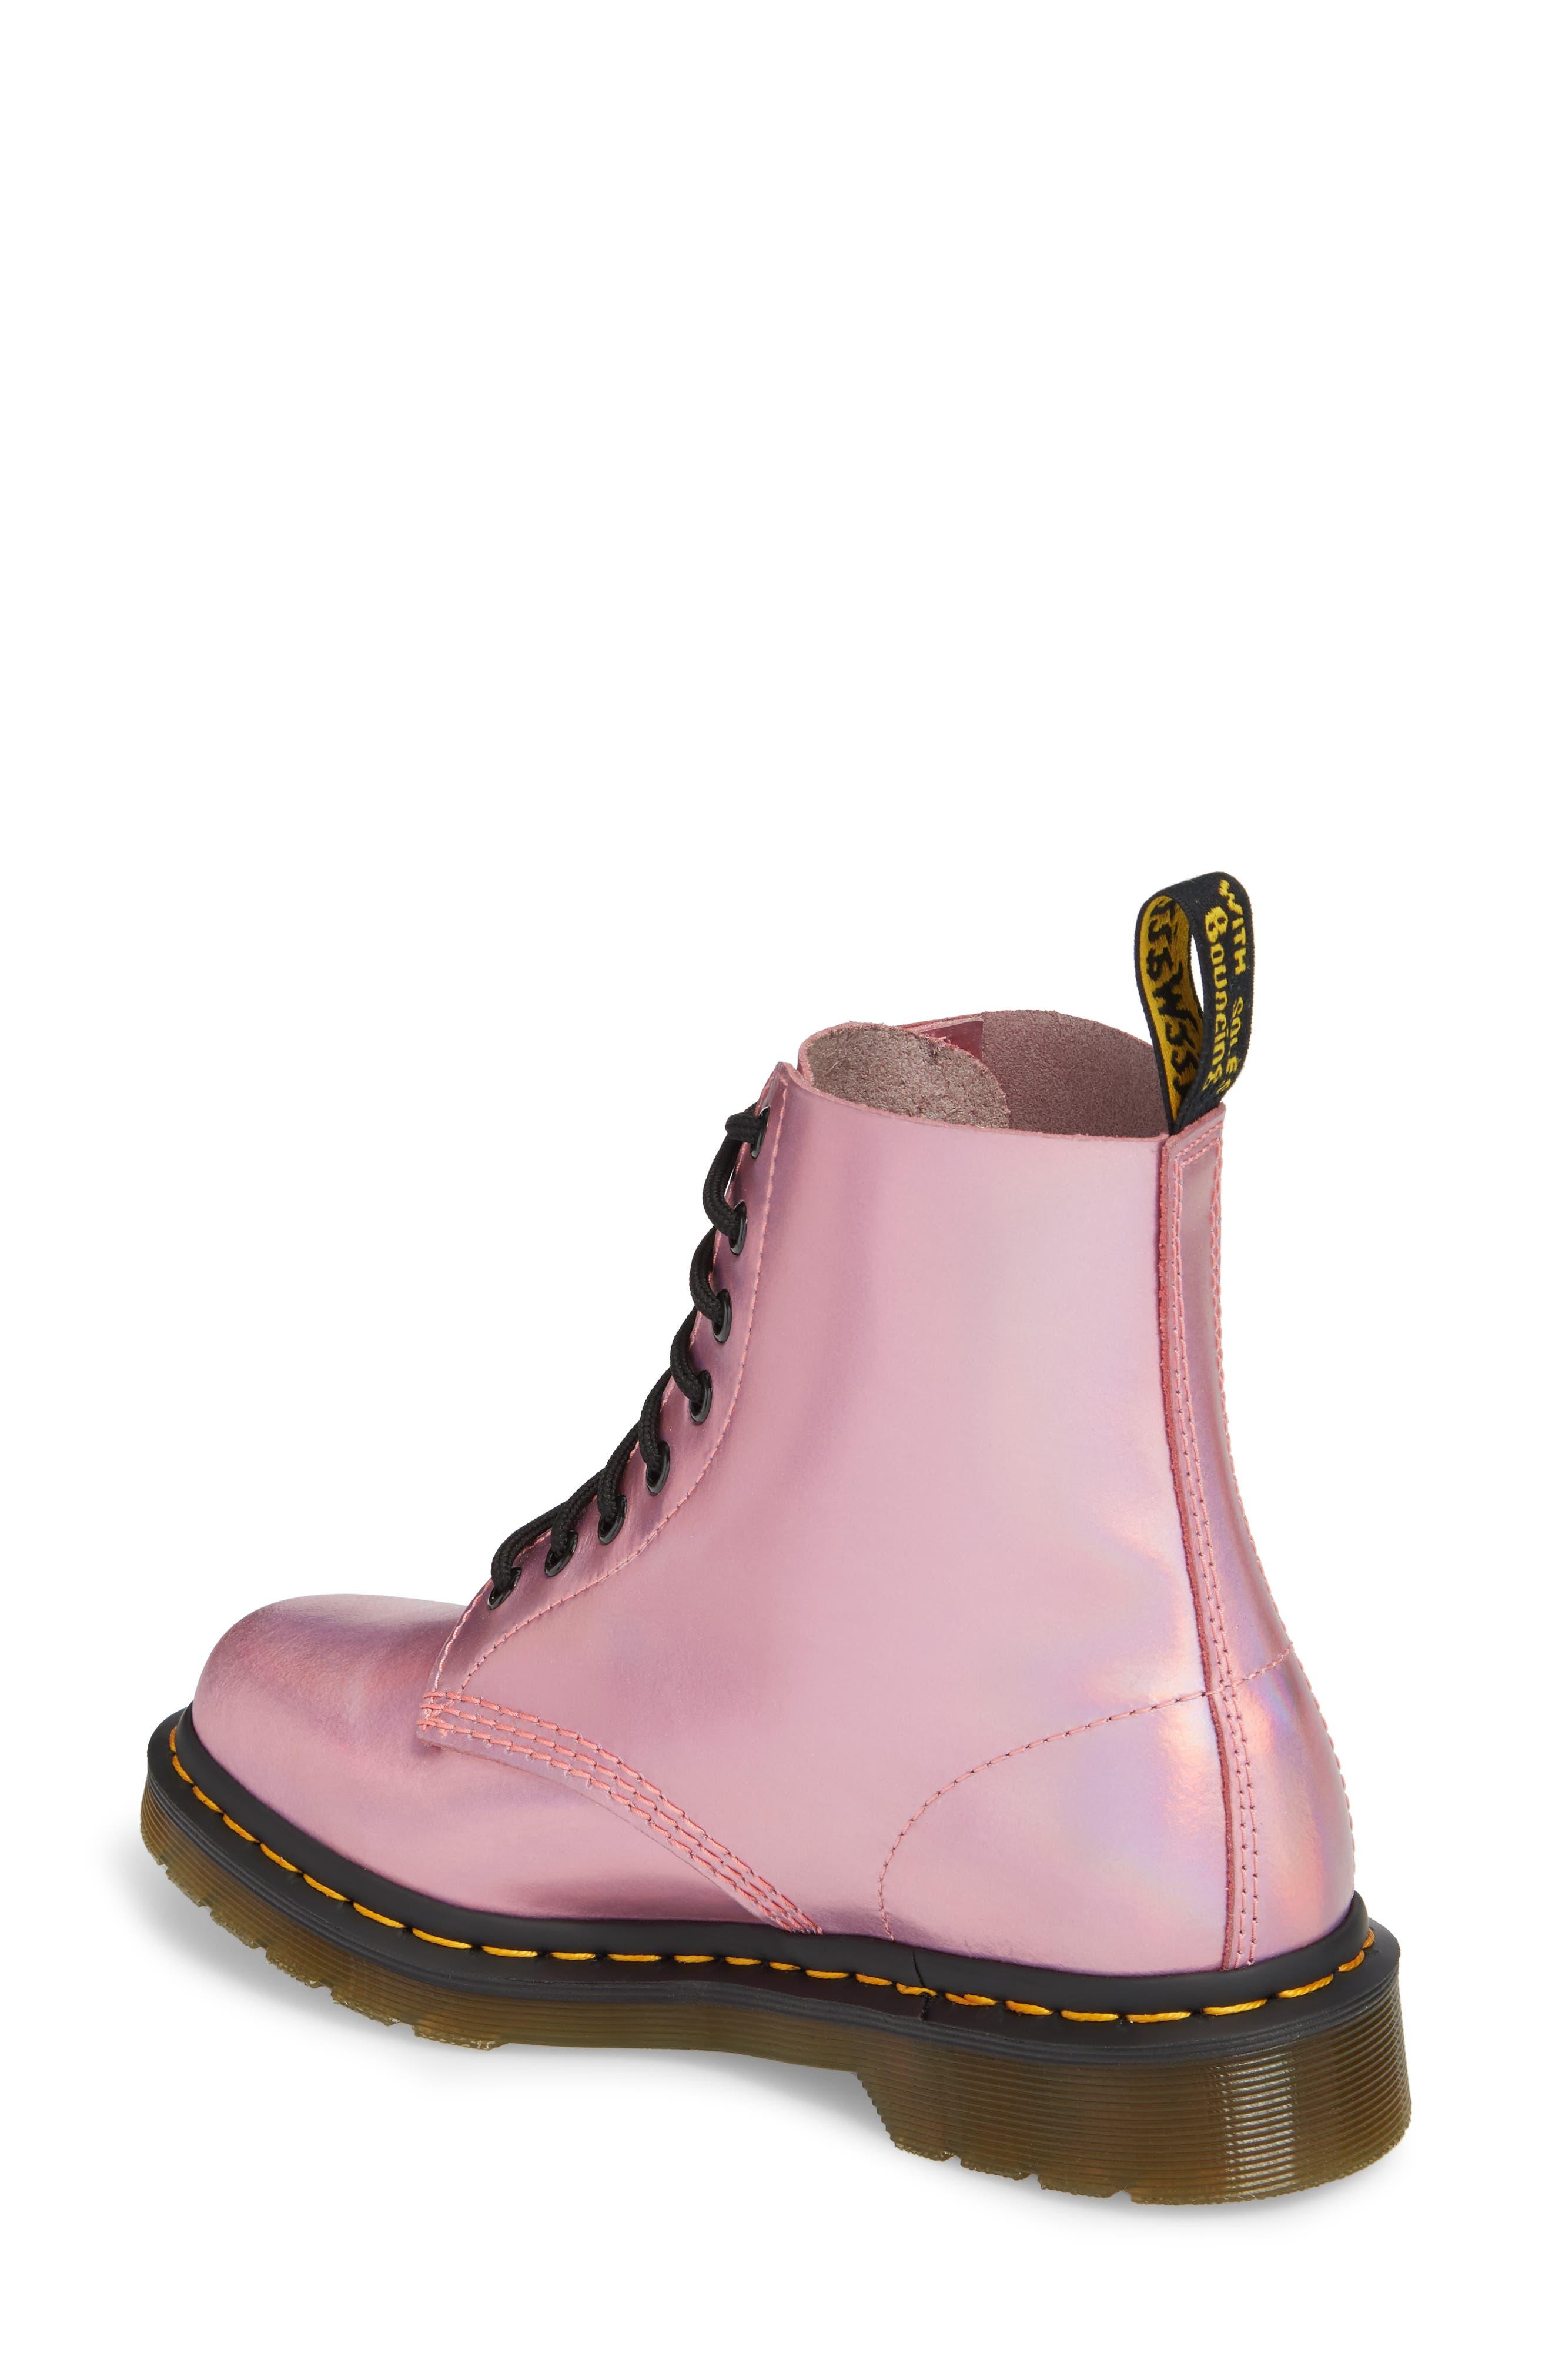 Pascal Metallic Combat Boot,                             Alternate thumbnail 3, color,                             Pink Metallic Leather